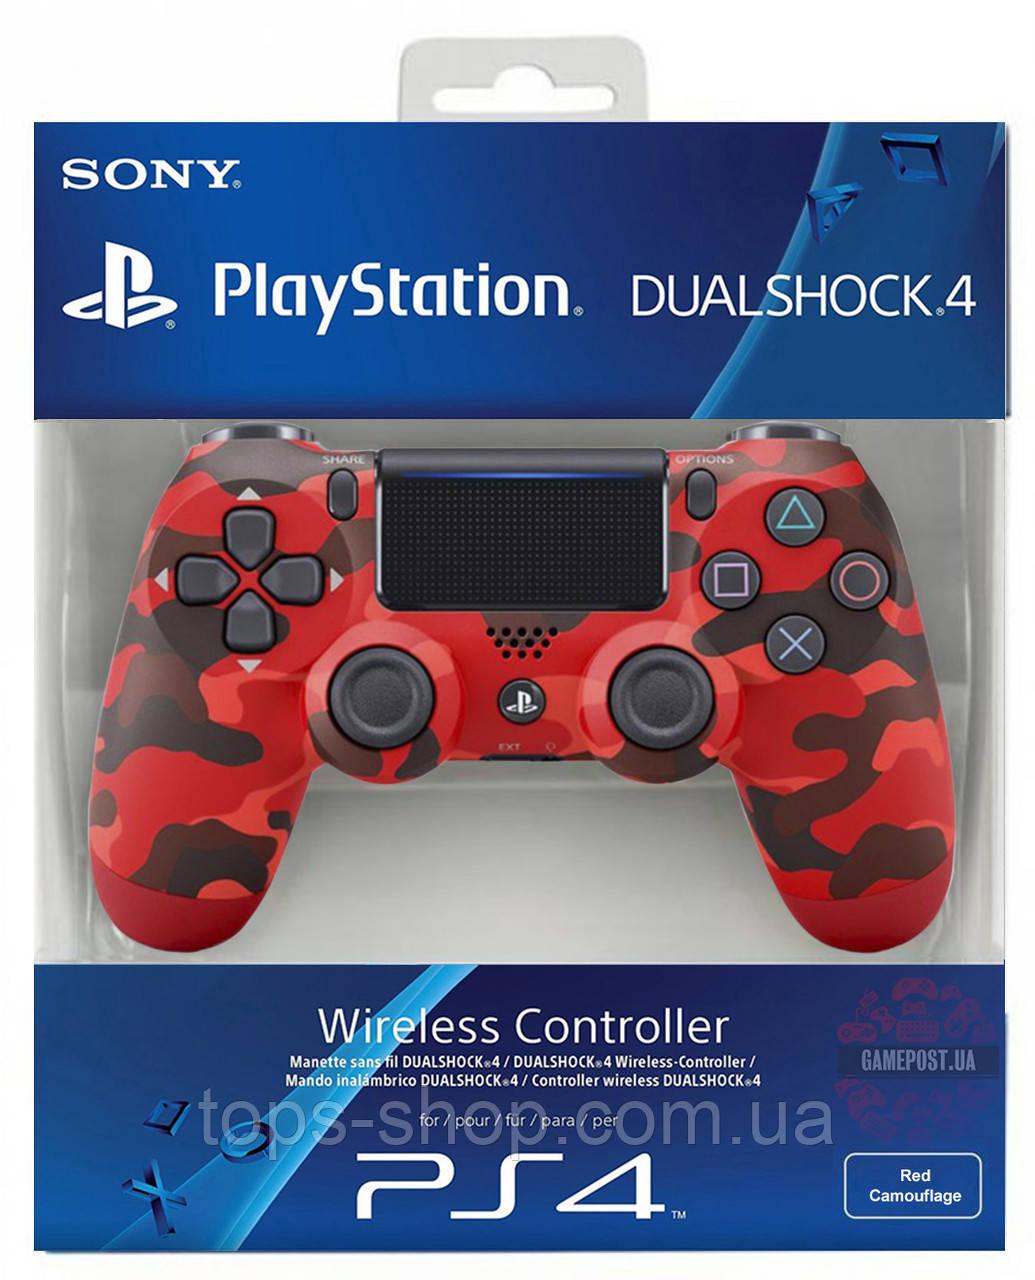 Джойстик геймпад Sony PS 4 DualShock 4 Wireless Controller Red Camouflage ( червоний камуфляж ) репліка